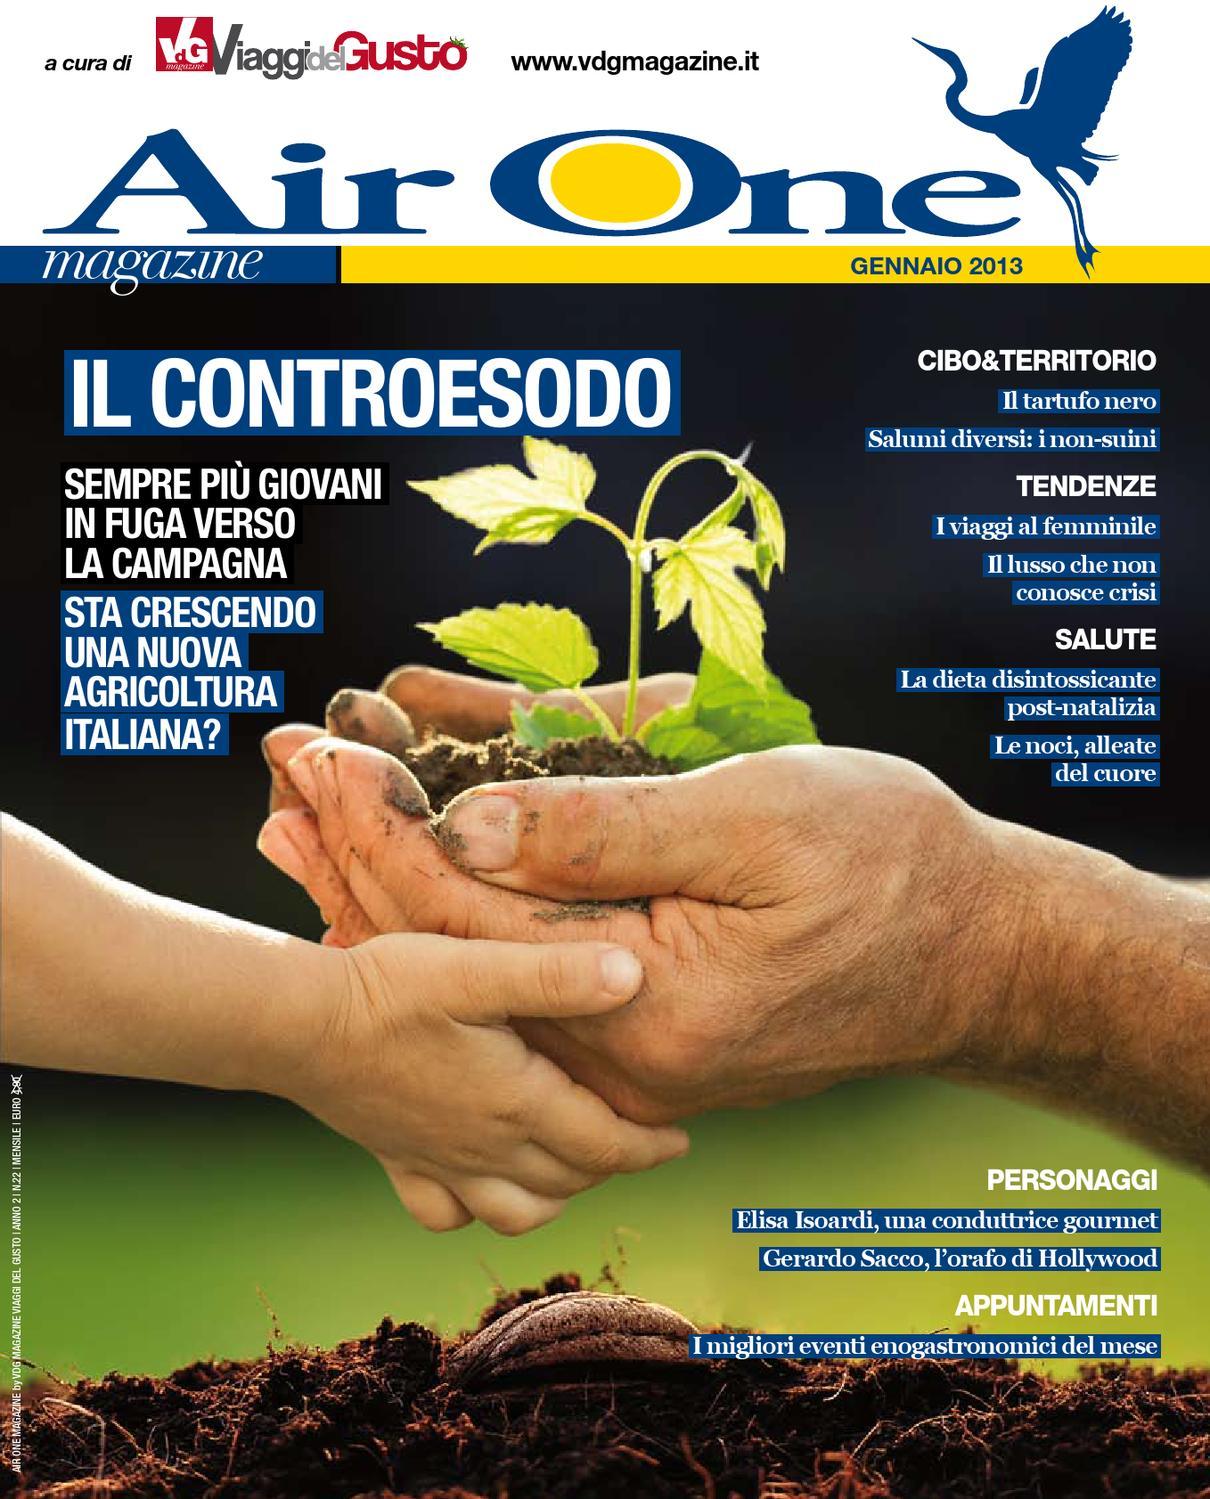 Air One magazine Gennaio 2013 by vdgmagazine - issuu ec0657065d4